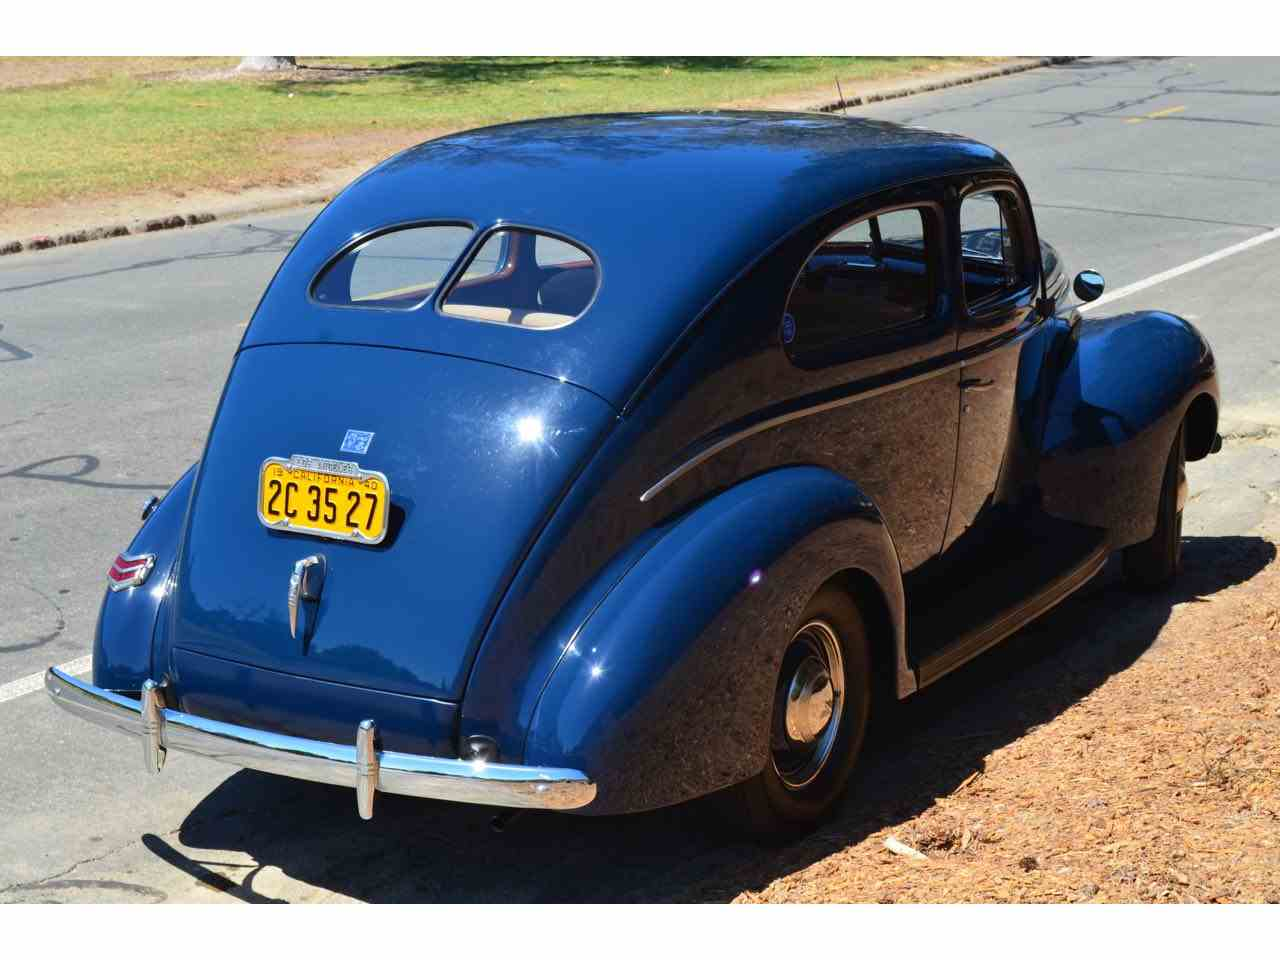 Large Picture of '40 Ford Tudor - $27,900.00 Offered by Spoke Motors - J9J9